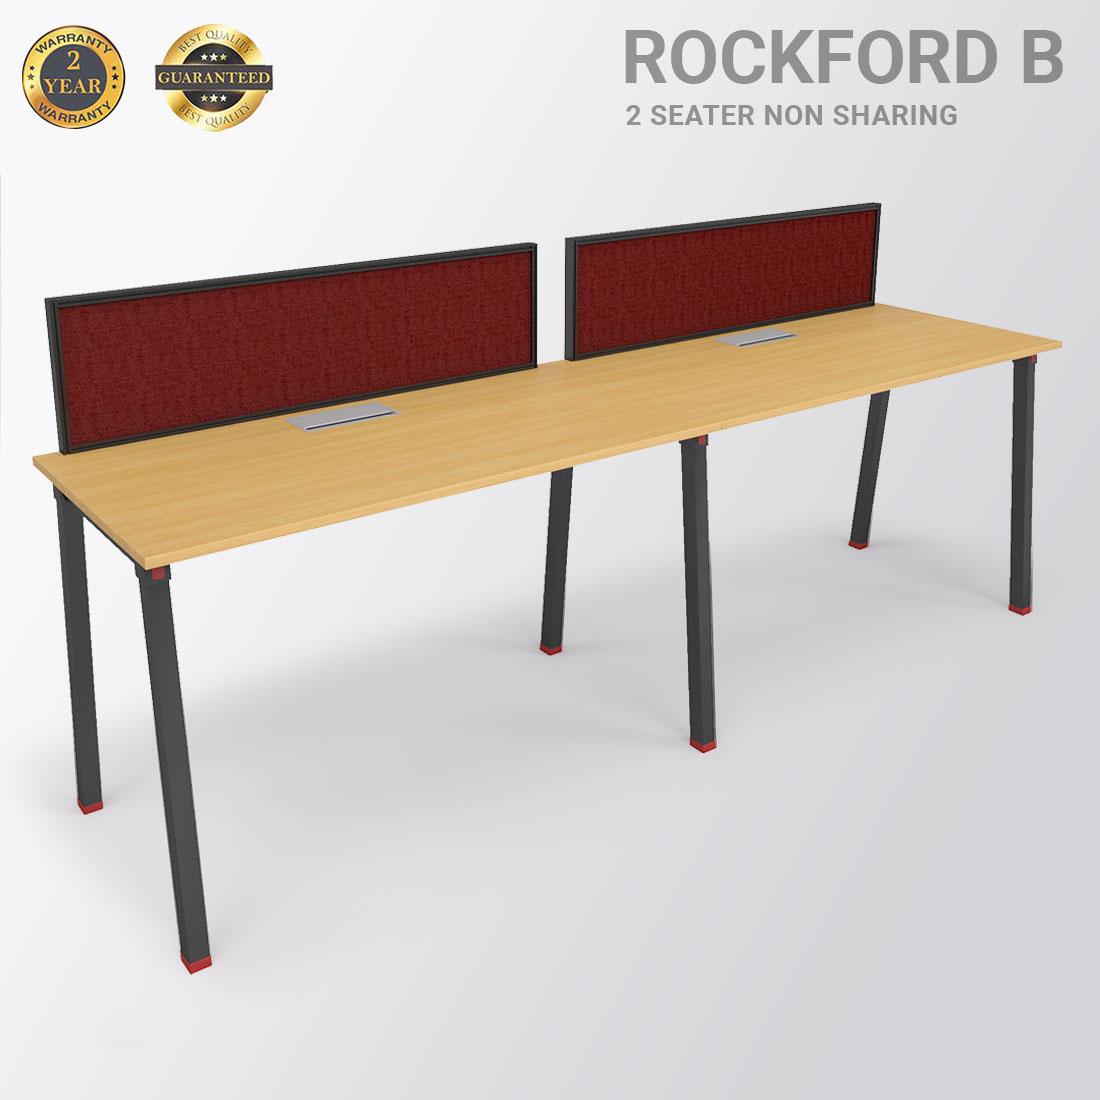 Rockford B 2 Seater  Non Sharing